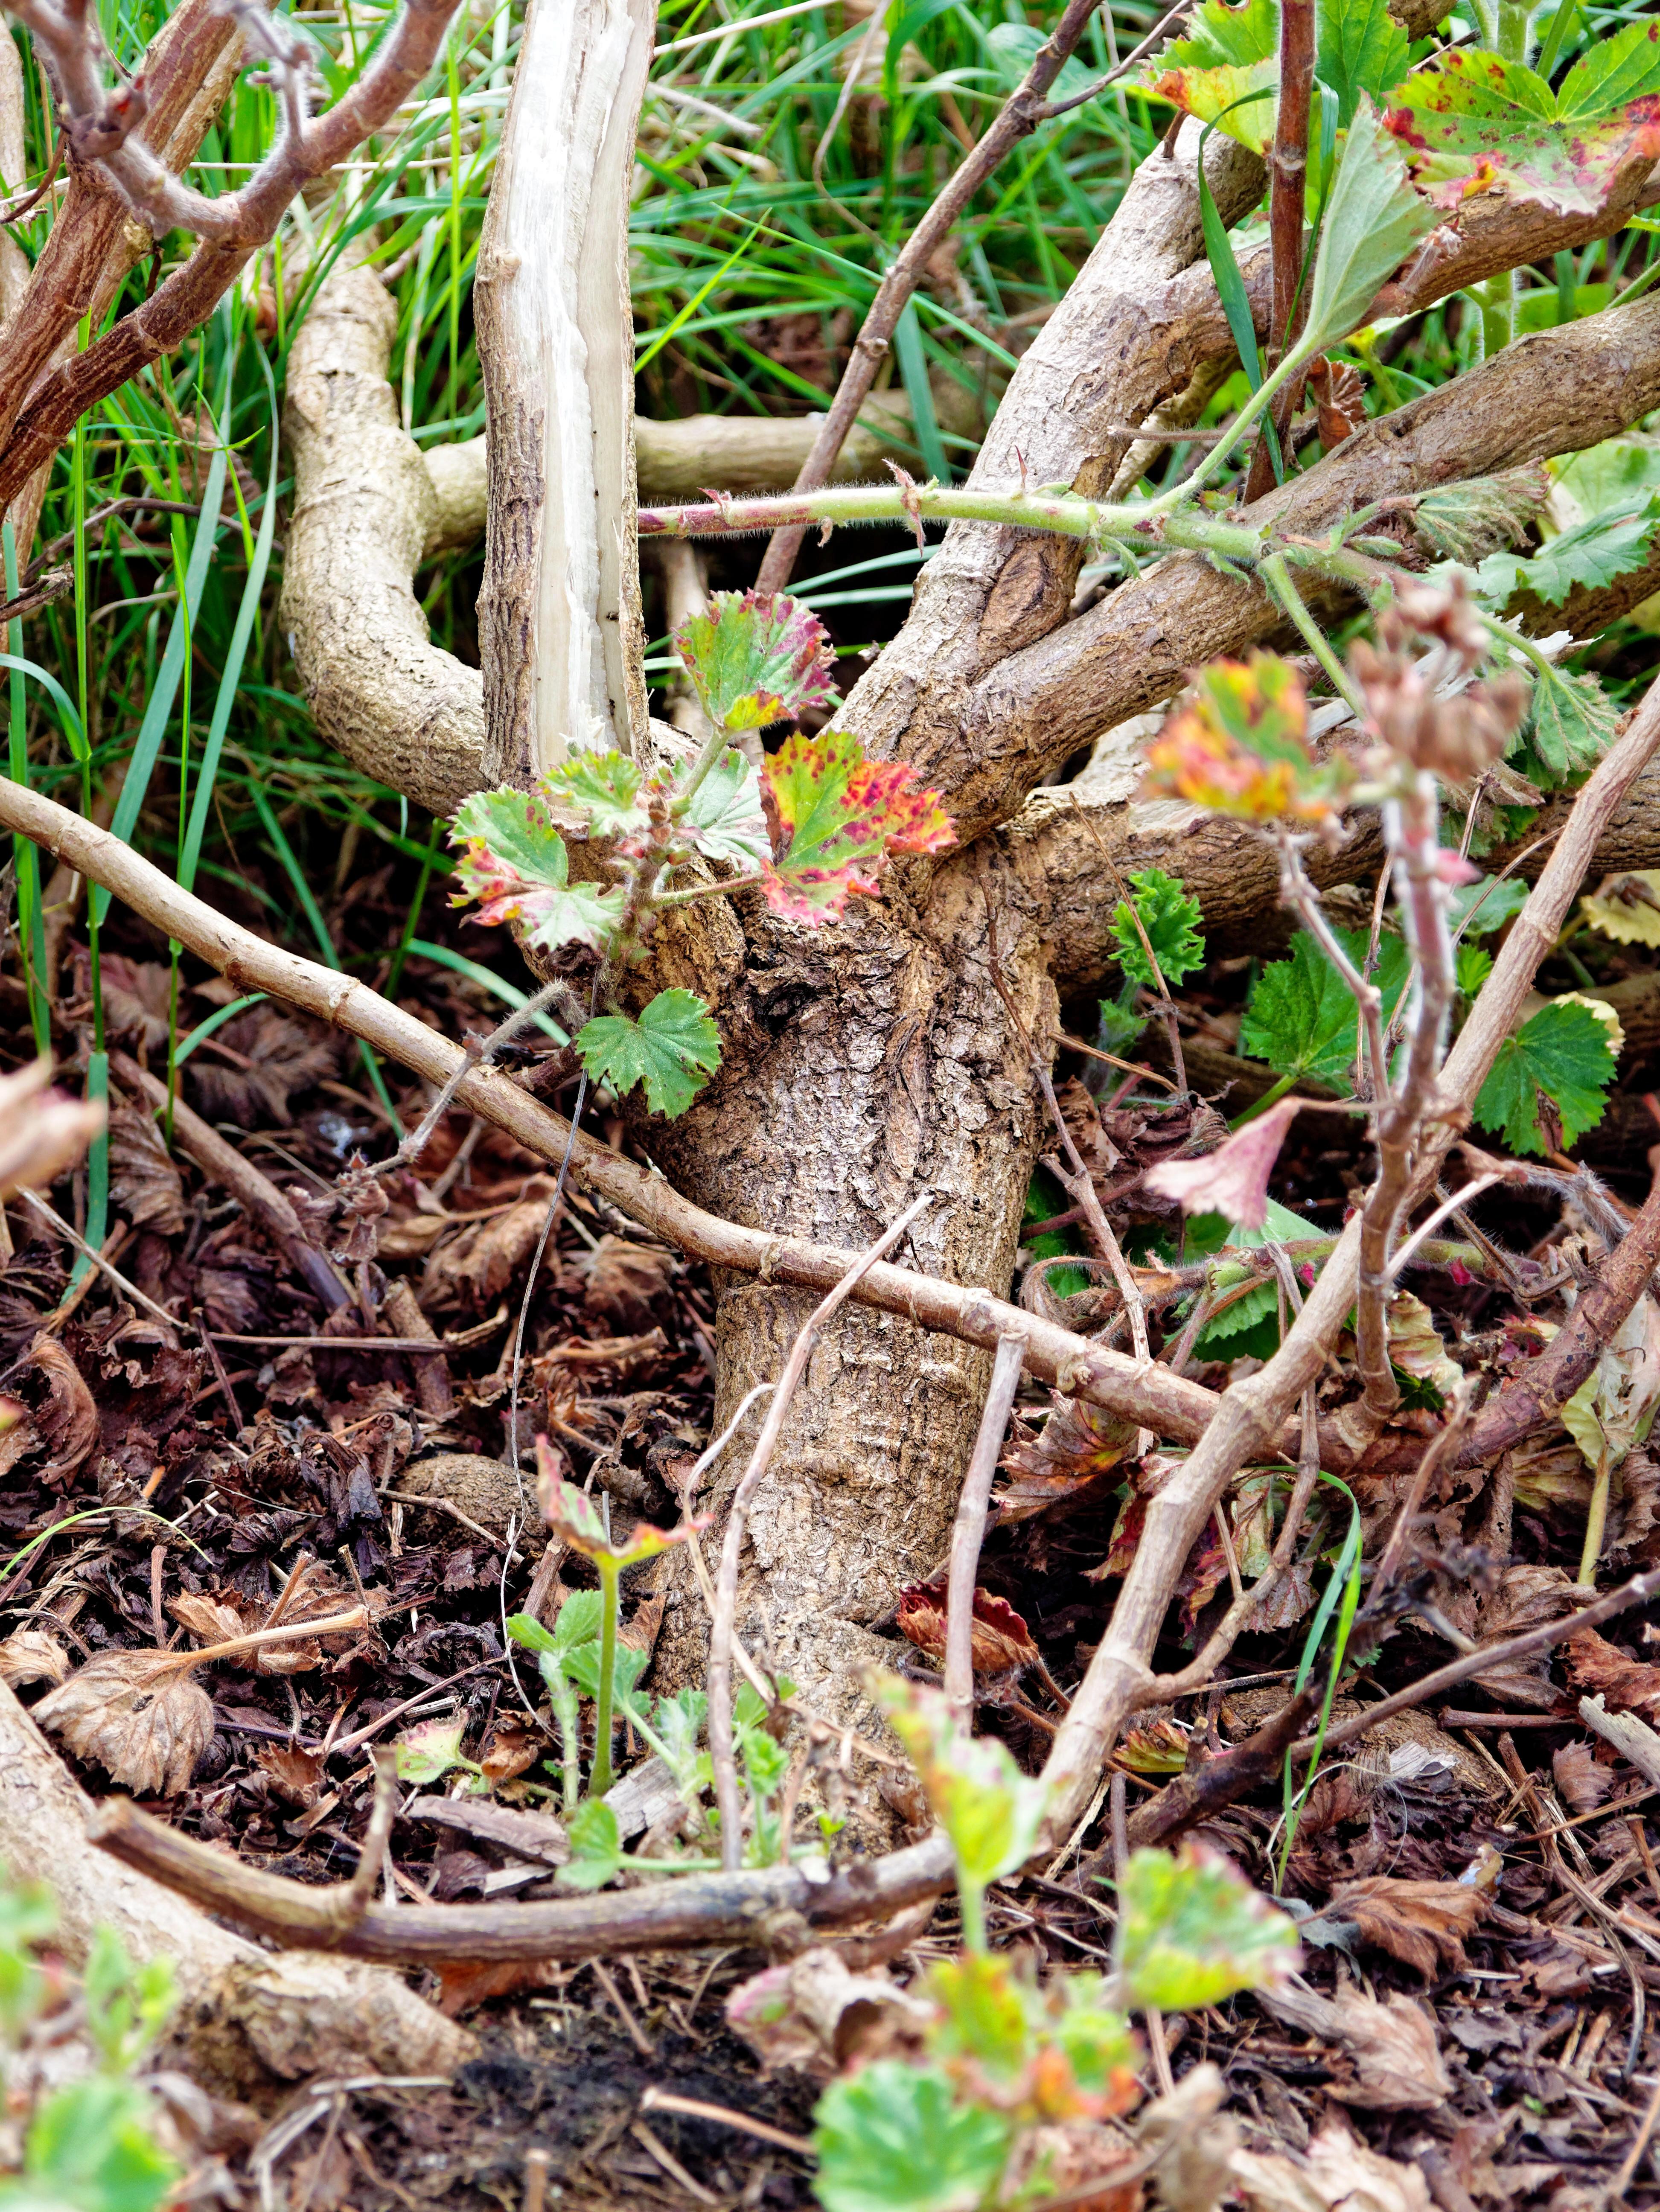 This should be Pelargonium-3.jpeg.  Is it missing?